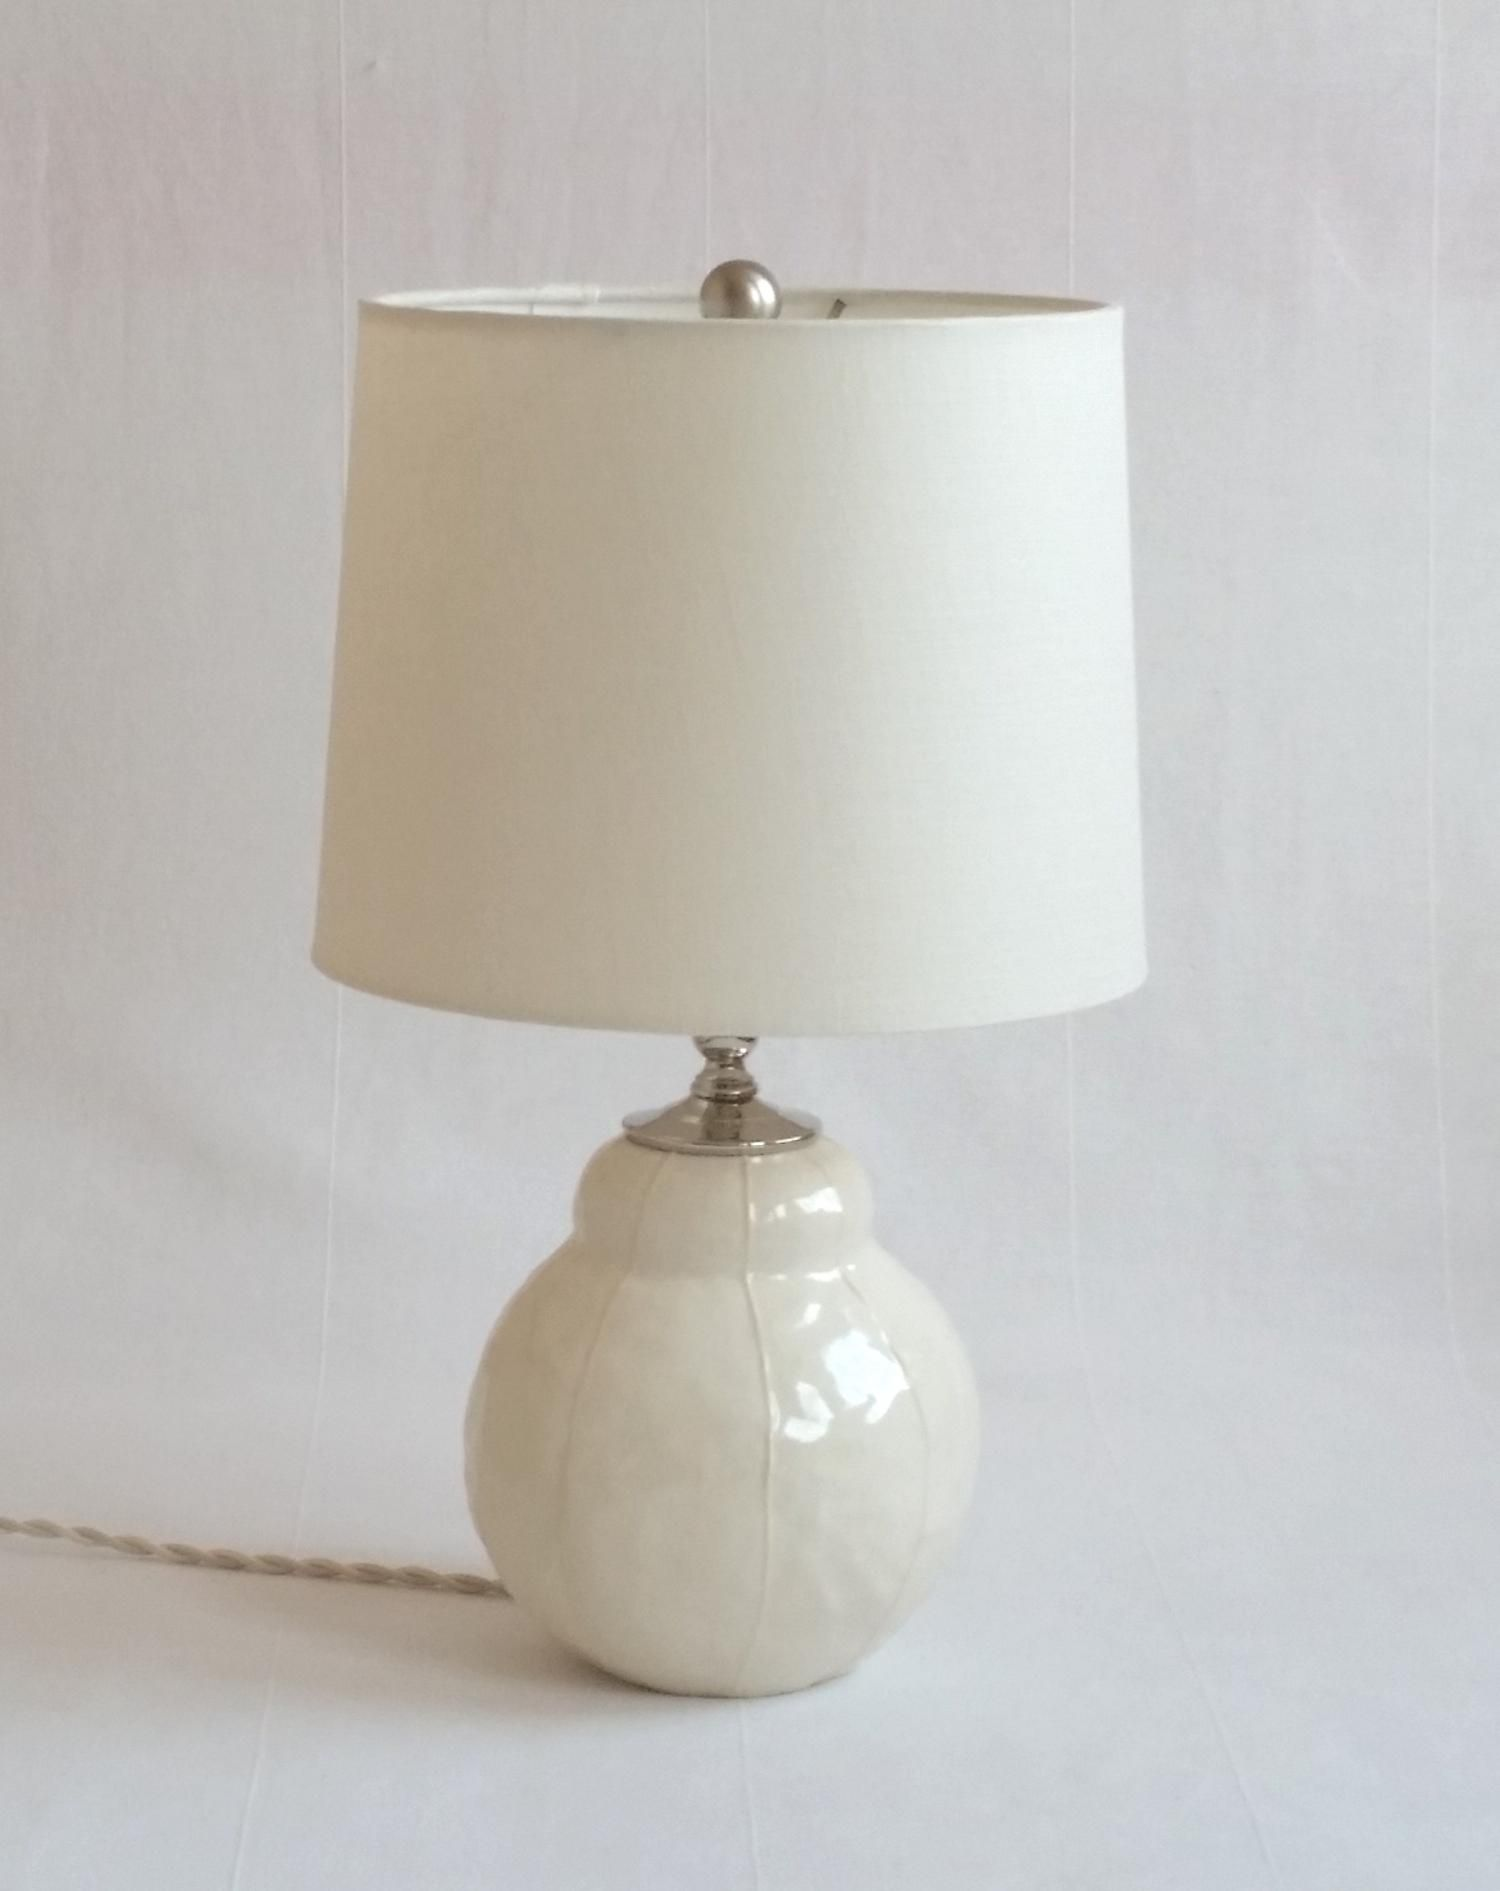 Vit Ceramics Bubble Lamp Drum Shade White Contemporary Pottery Lamp Base Modern Handmade Kri Kri Studio Seattle Lamp Pottery Lamp Bubble Lamps